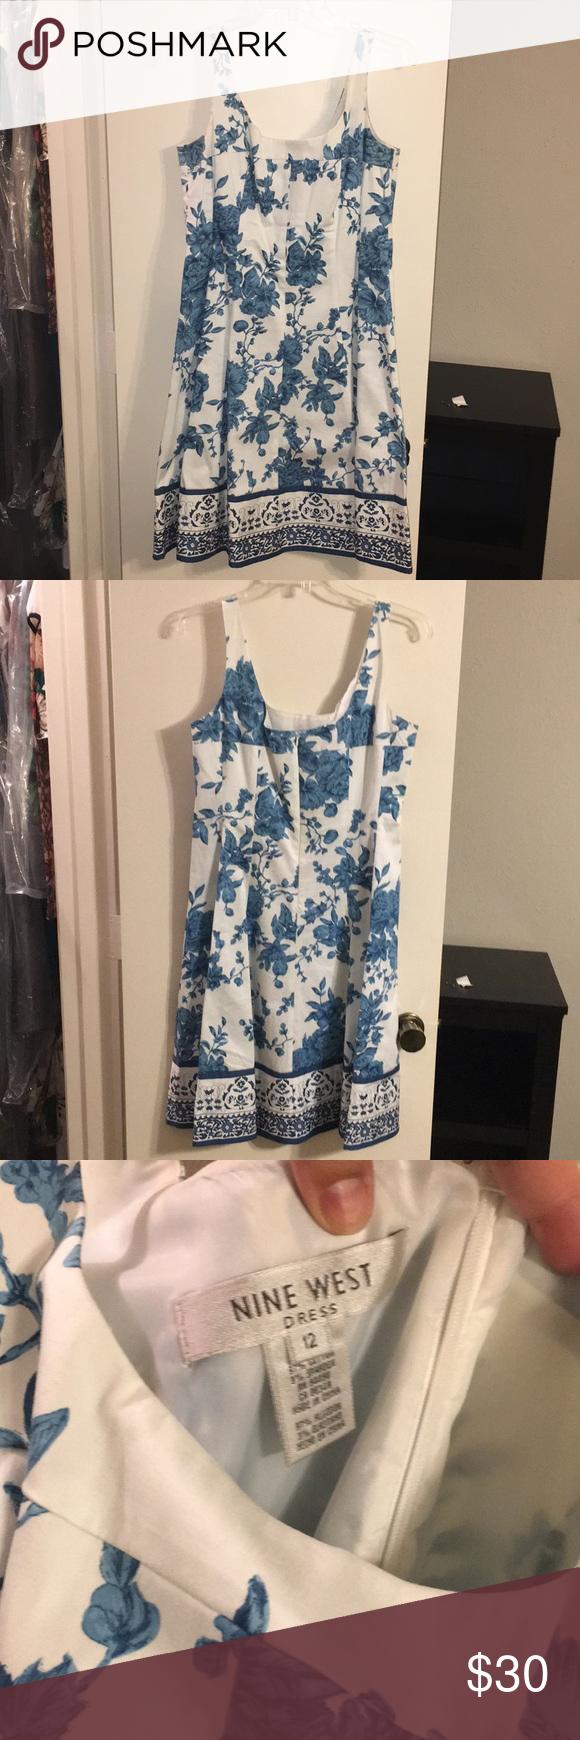 Nine West Dress Size 12 White With Blue Flowers Dresses Spring Summer Dress Summer Dresses [ 1740 x 580 Pixel ]